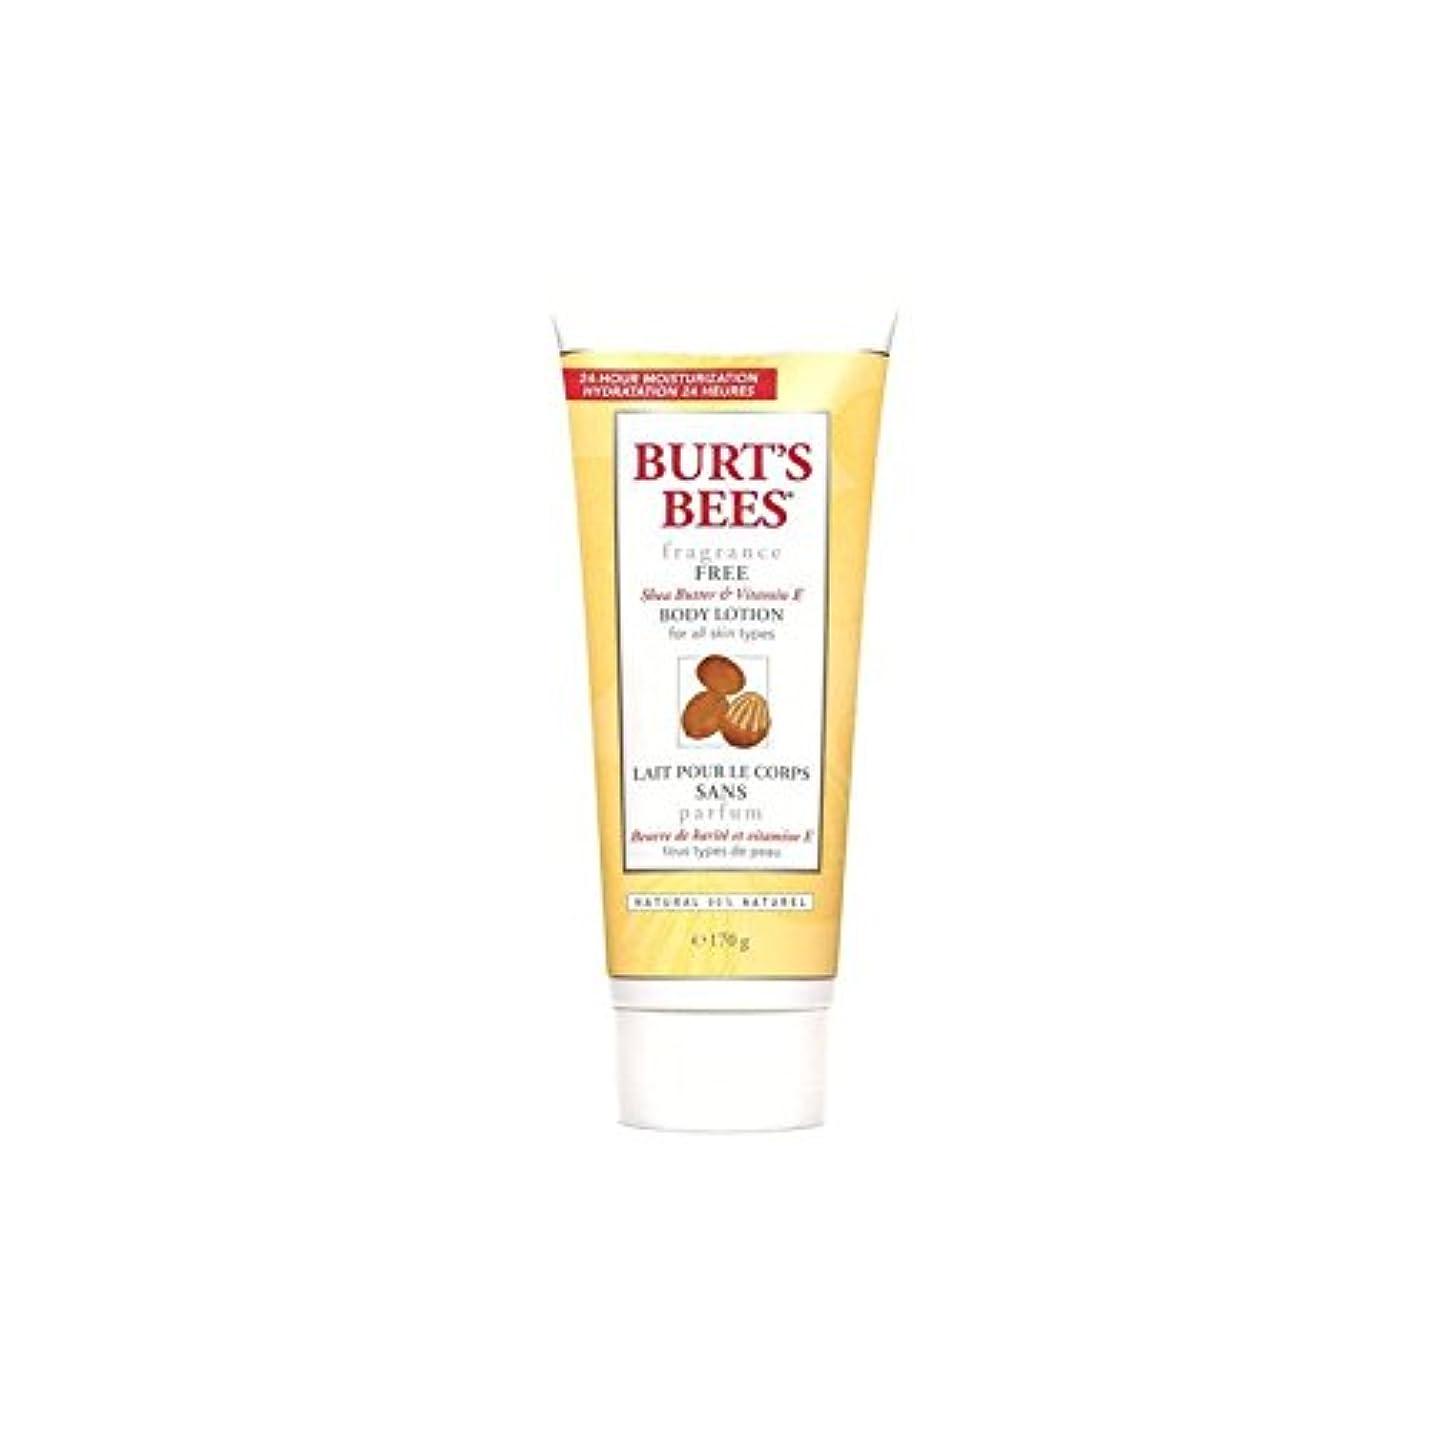 Burt's Bees Body Lotion - Fragrance Free 6fl oz (Pack of 6) - バーツビーボディローション - 無香料6オンス x6 [並行輸入品]